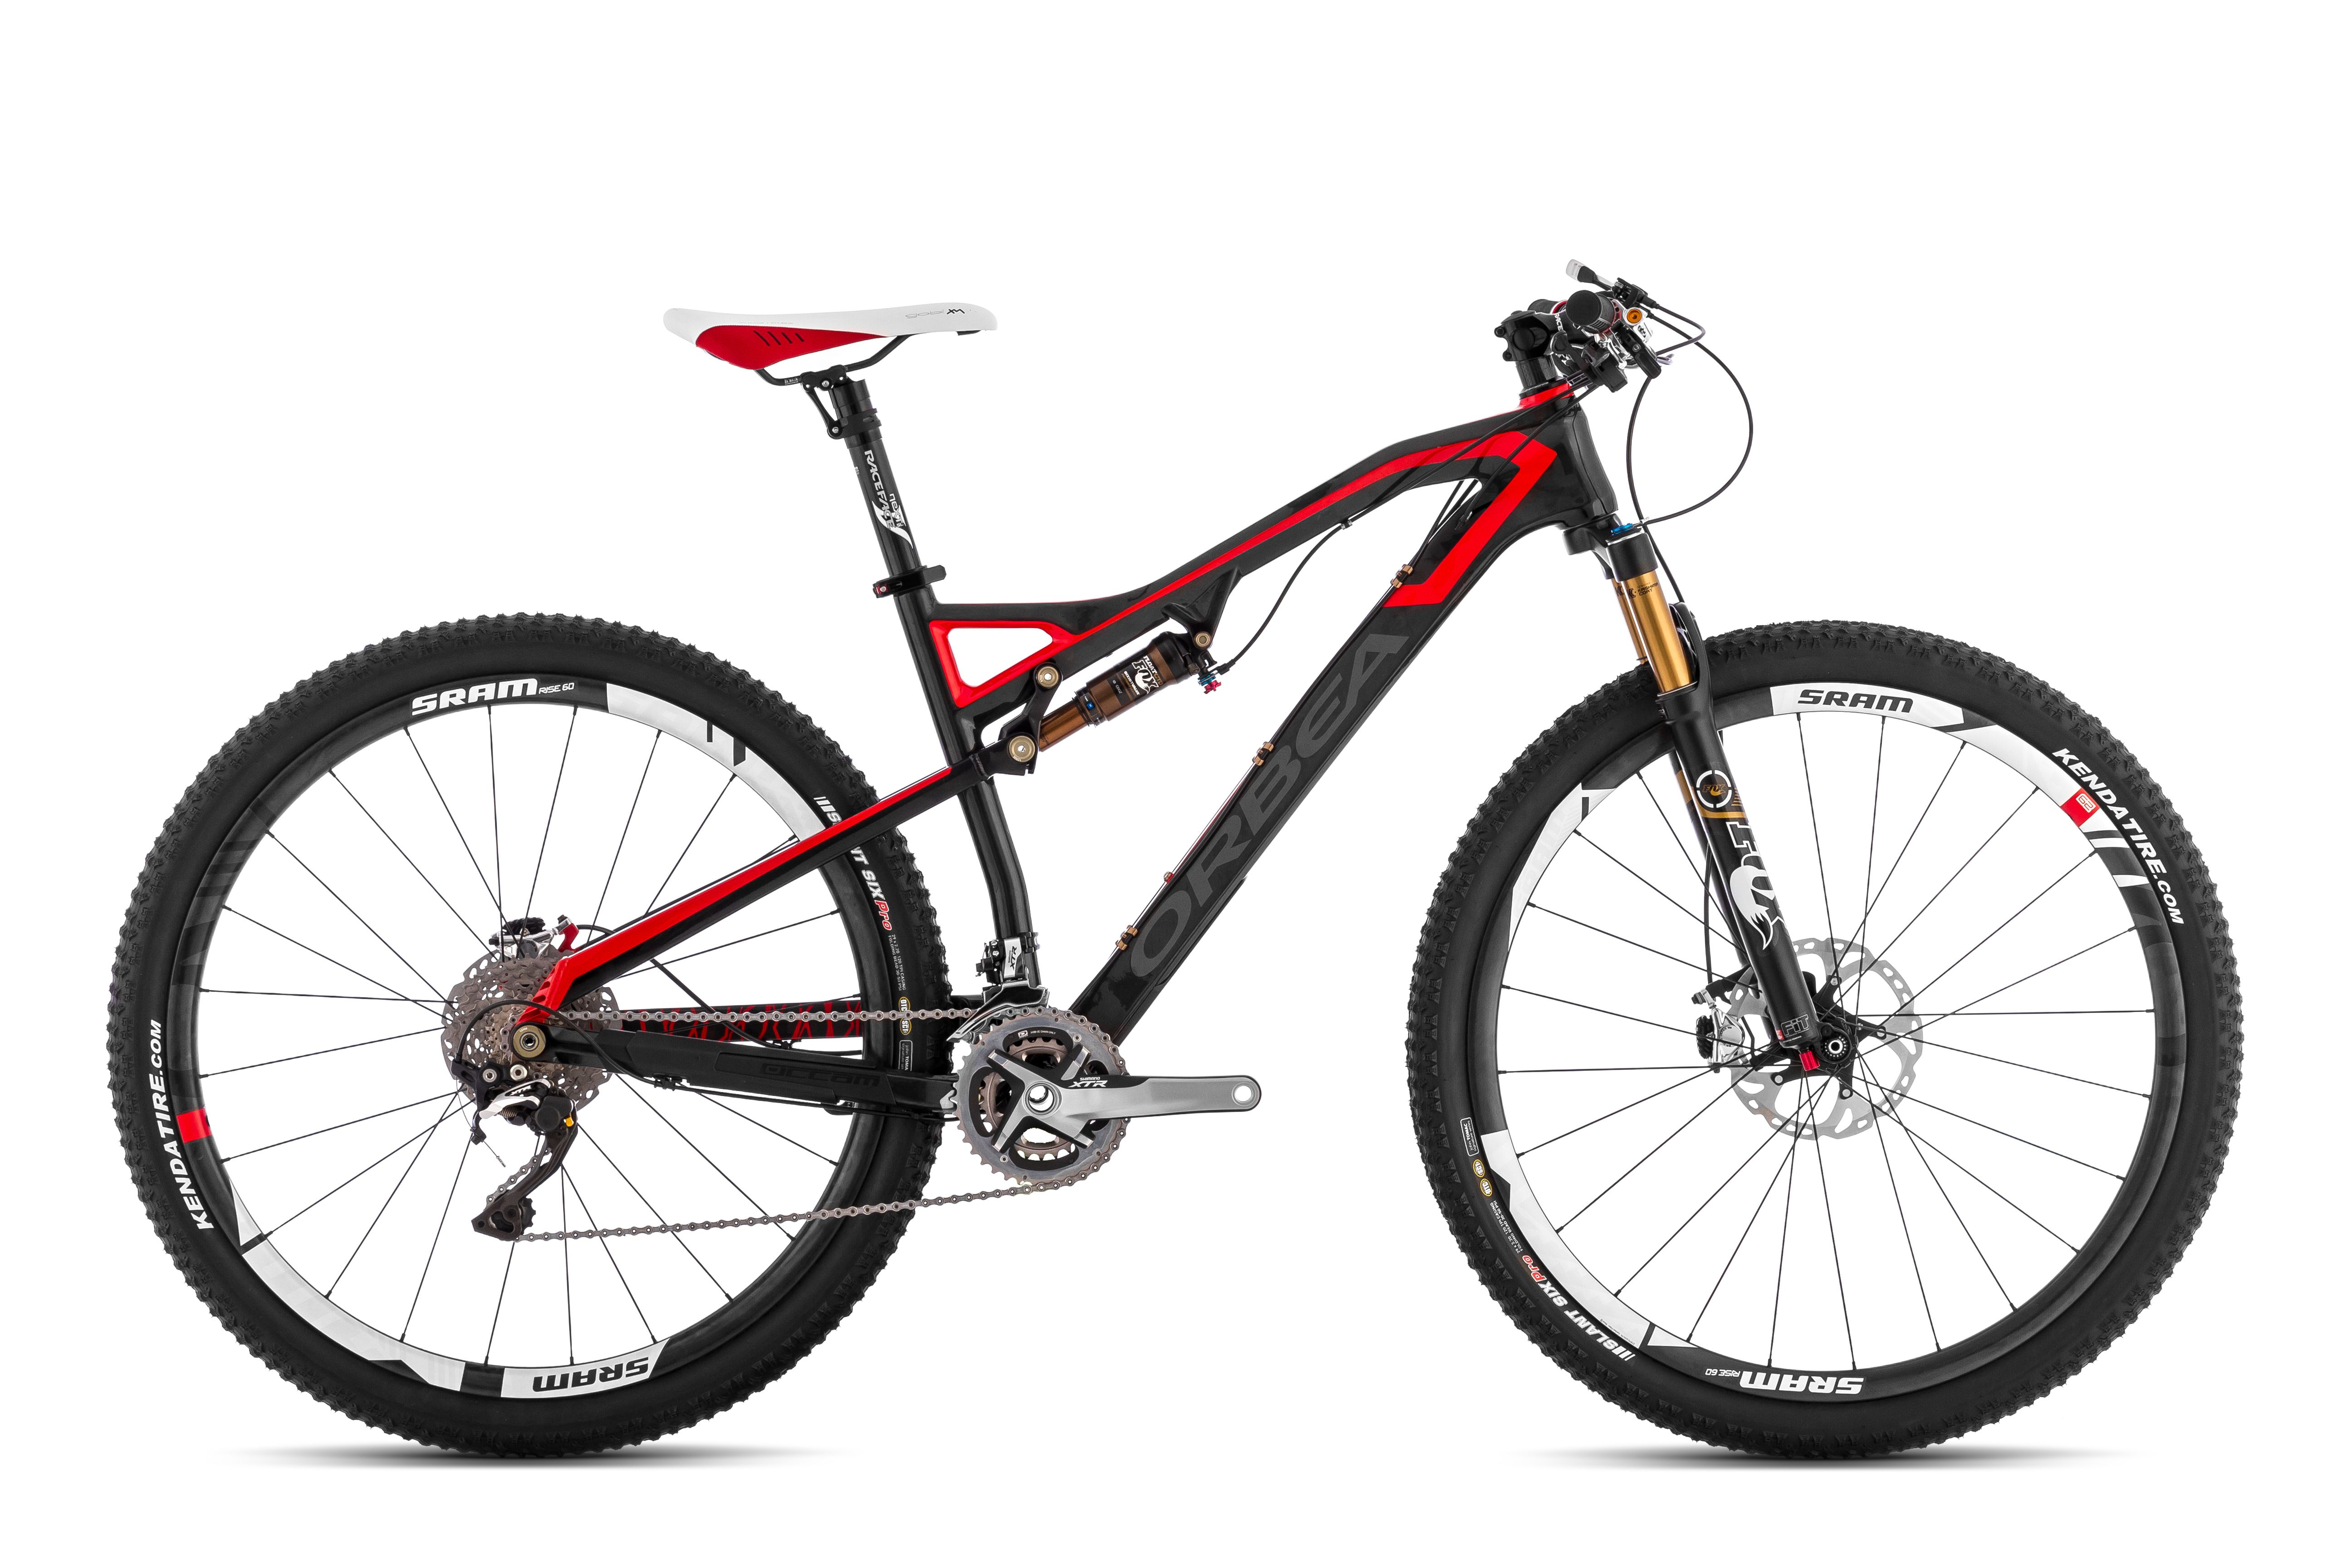 Bicicleta Orbea Occam 29 M10 2014 #bikes #bikestocks | bicicletas ...